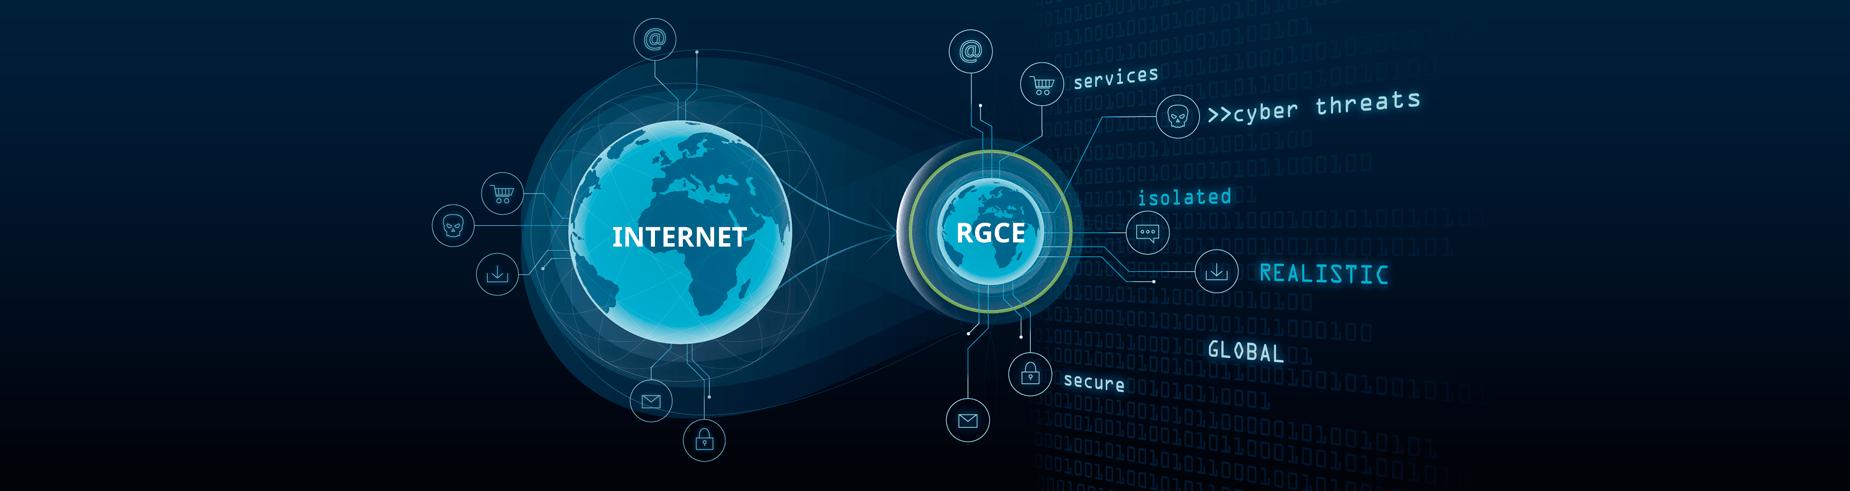 Securing Networks